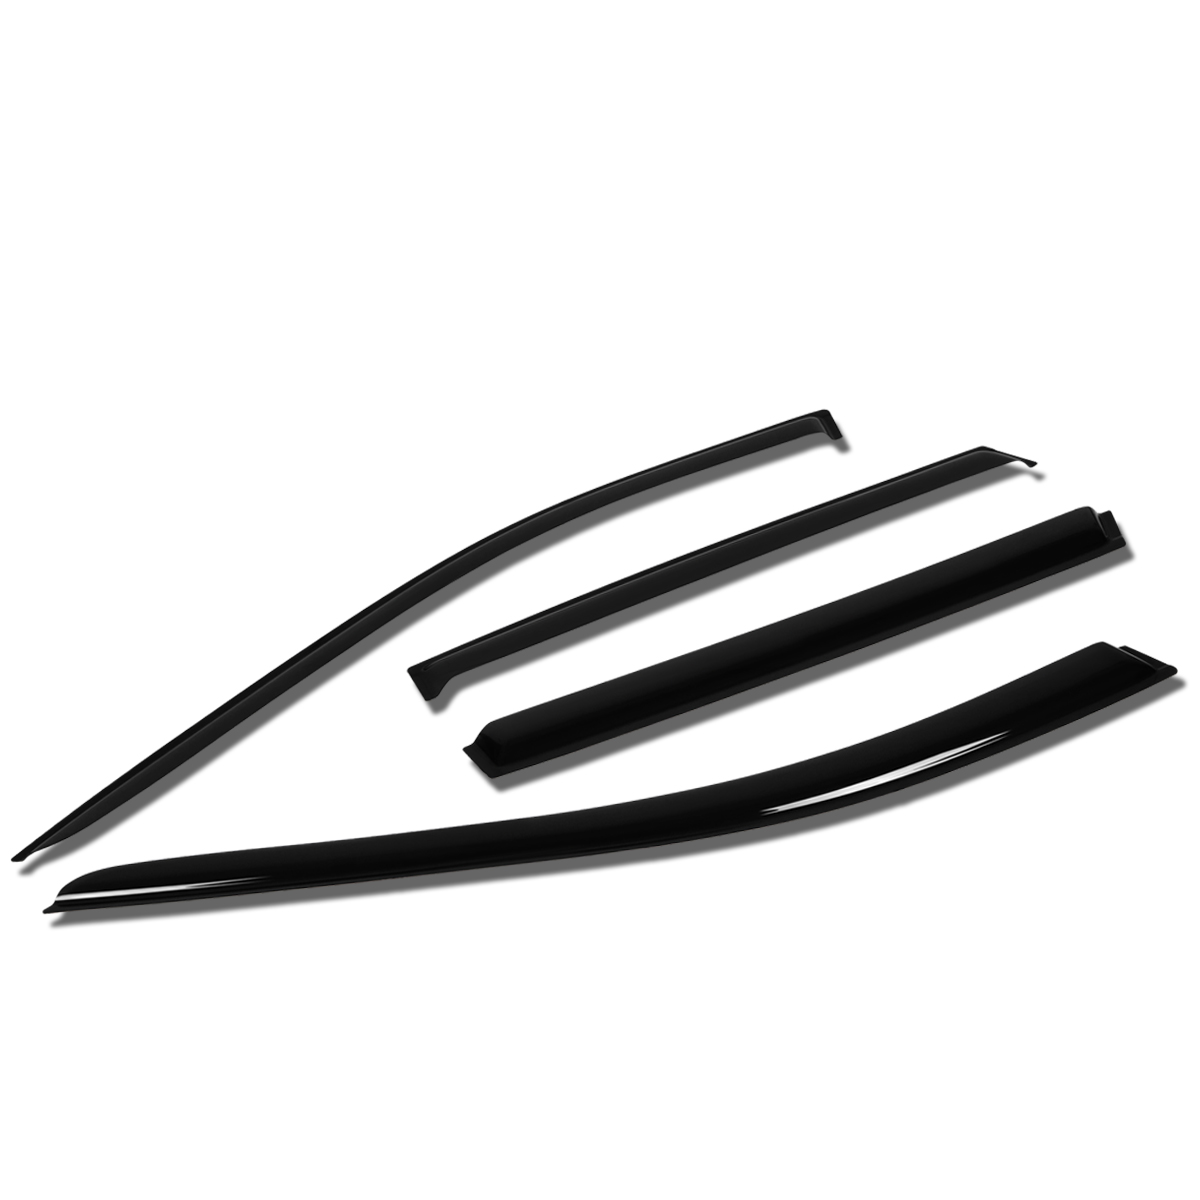 For 14-17 Nissan Rogue 4pcs Window Vent Visor Deflector Rain Guard (Dark Smoke) 15 16